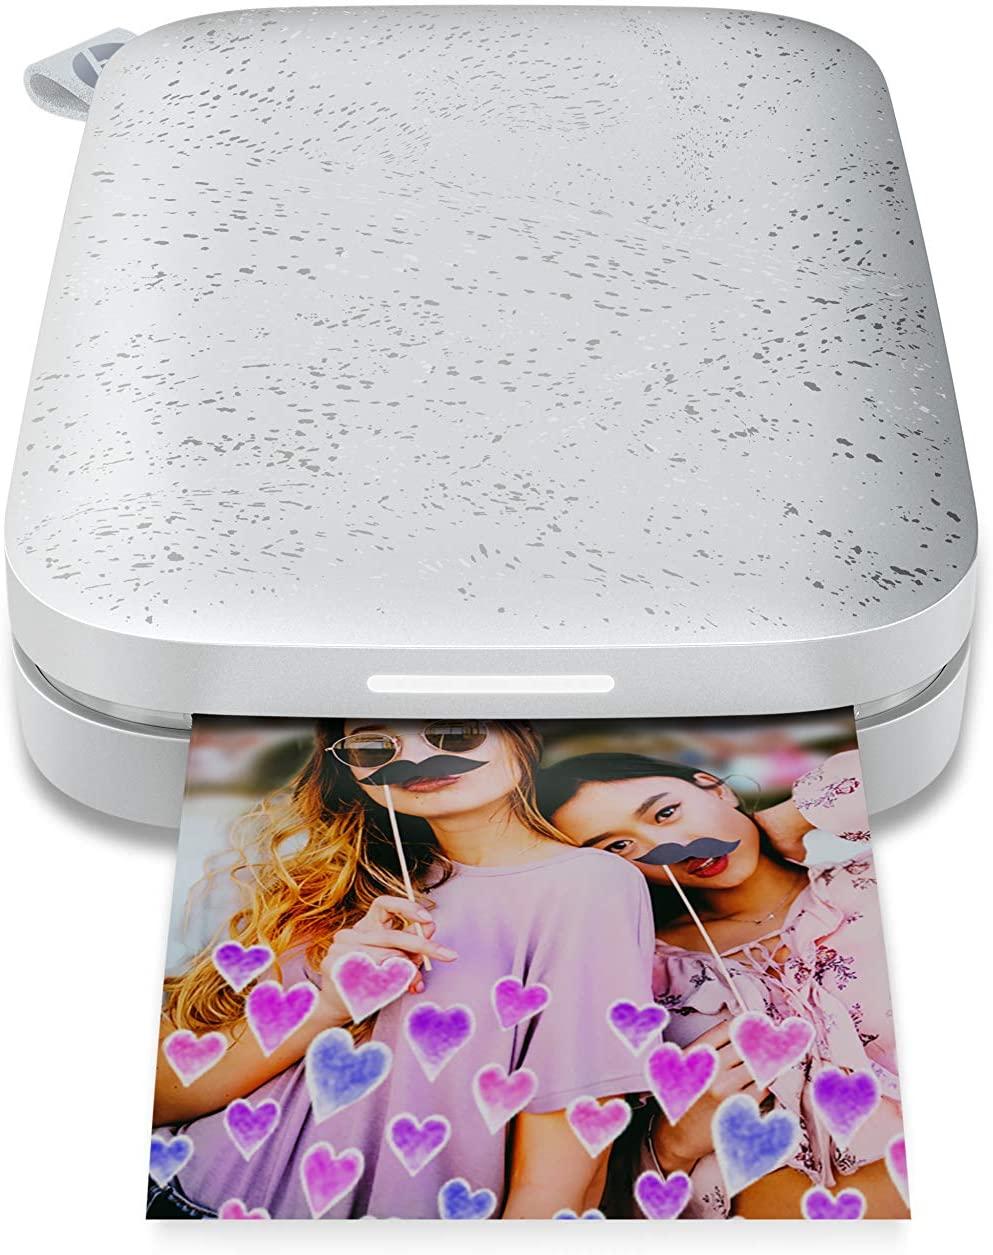 HP Sprocket 200 Bundle best instant photo printer UK reviews